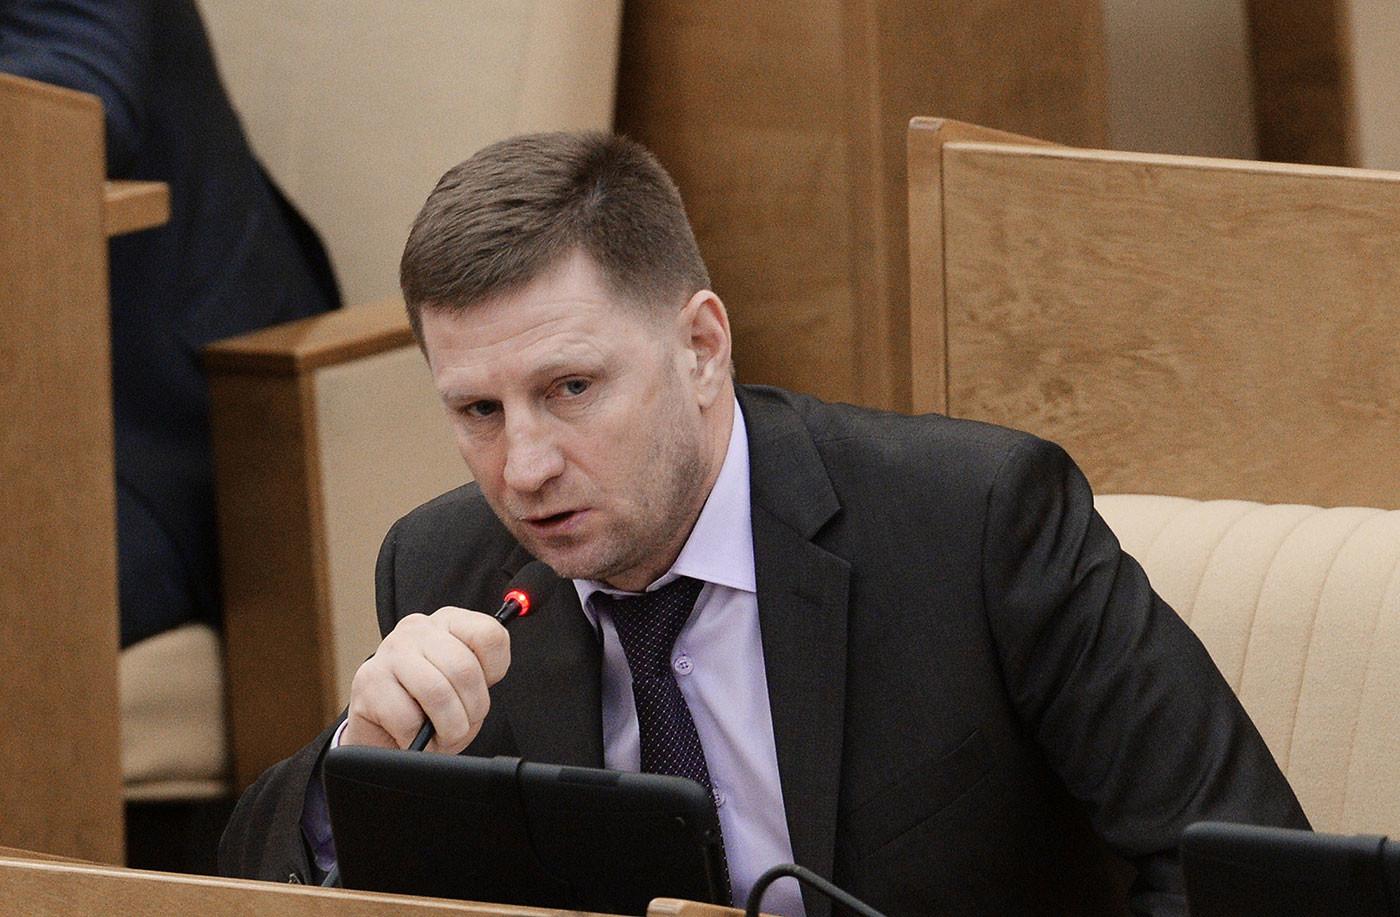 Фото: © РИА Новости/Владимир Федоренко